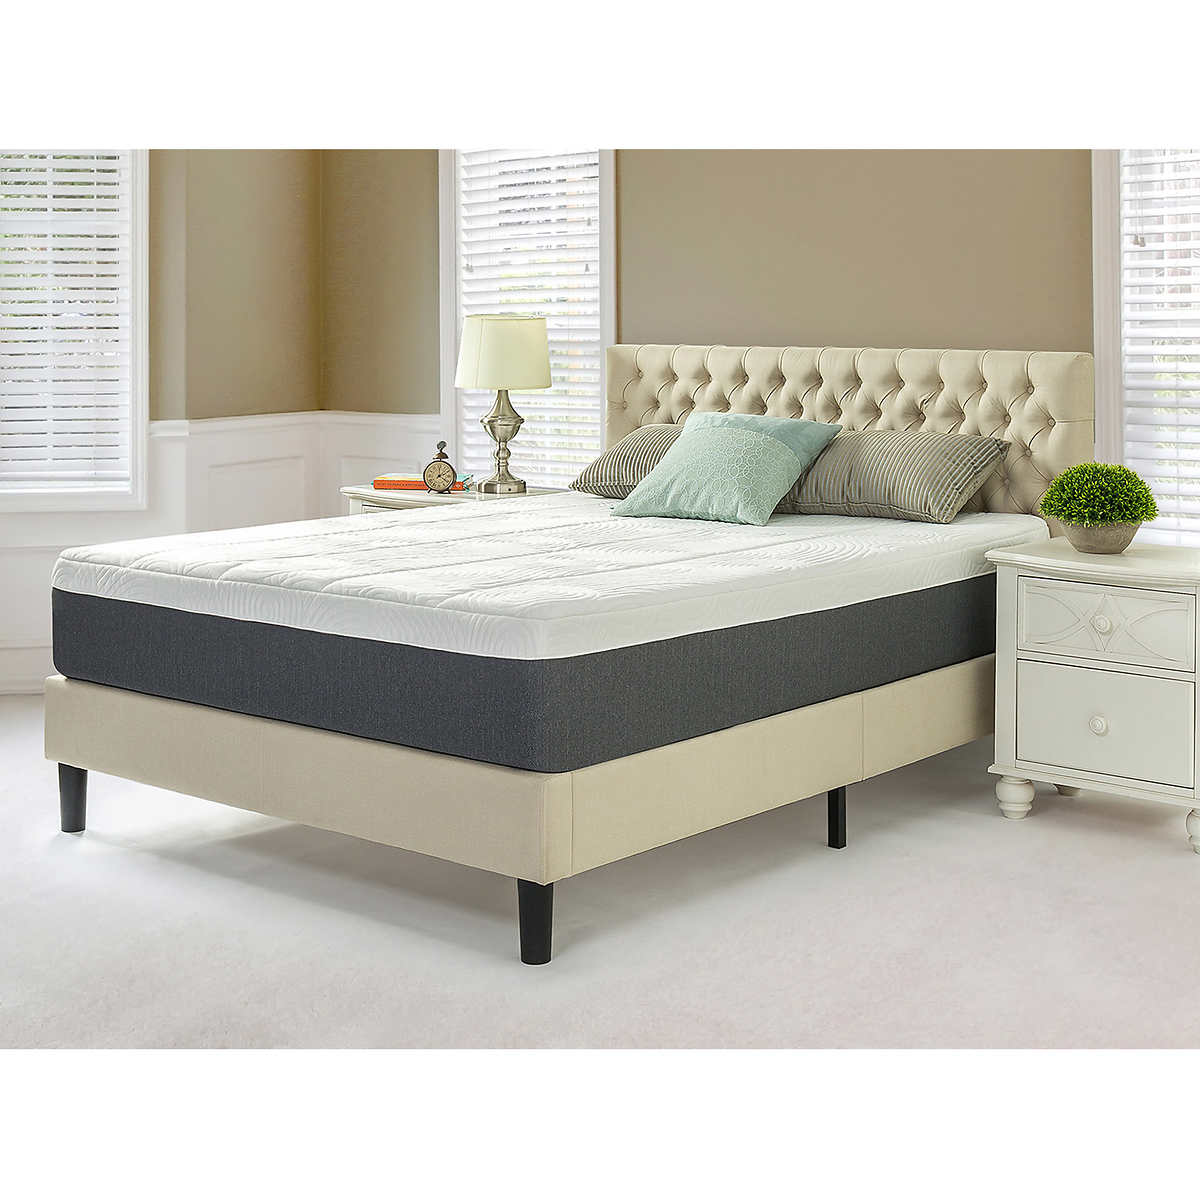 blackstone queen set 12 memory foam mattress and platform bed